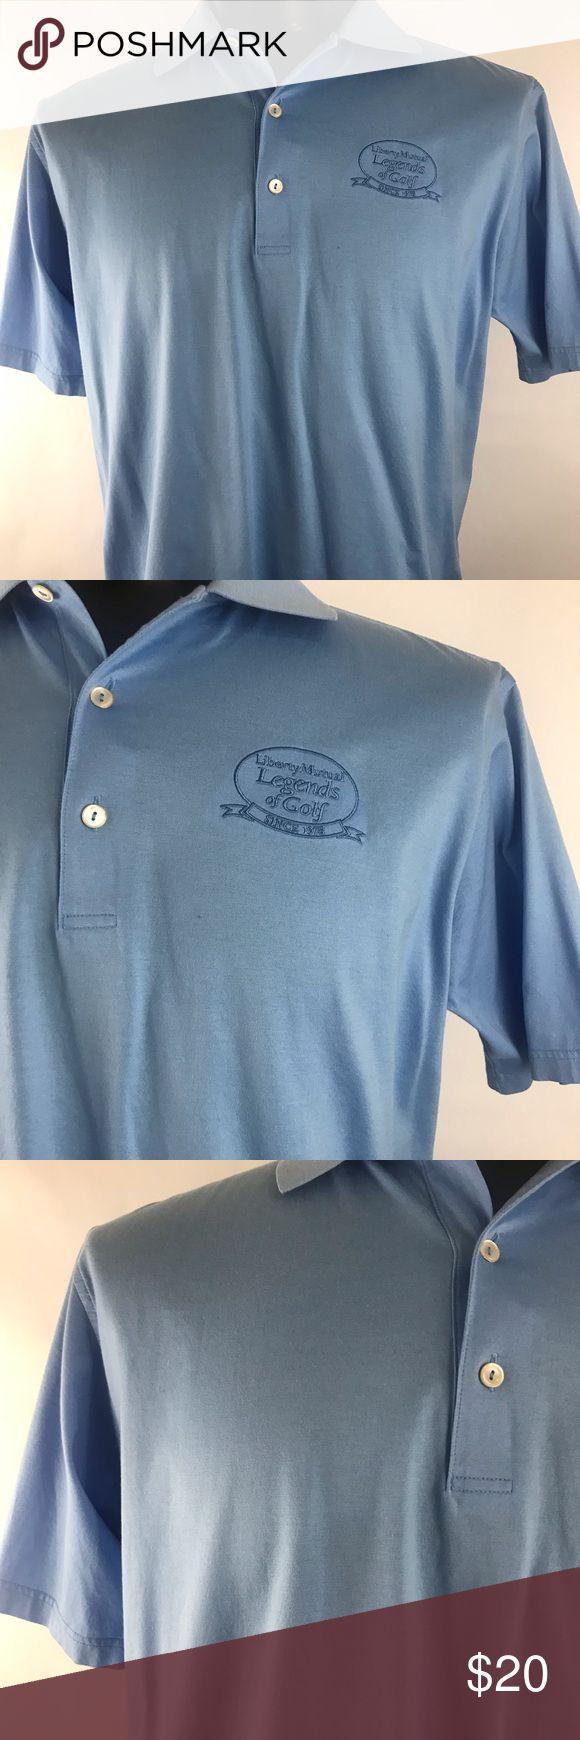 Men's Peter Millar Golf Polo Shirt Golf polo shirts